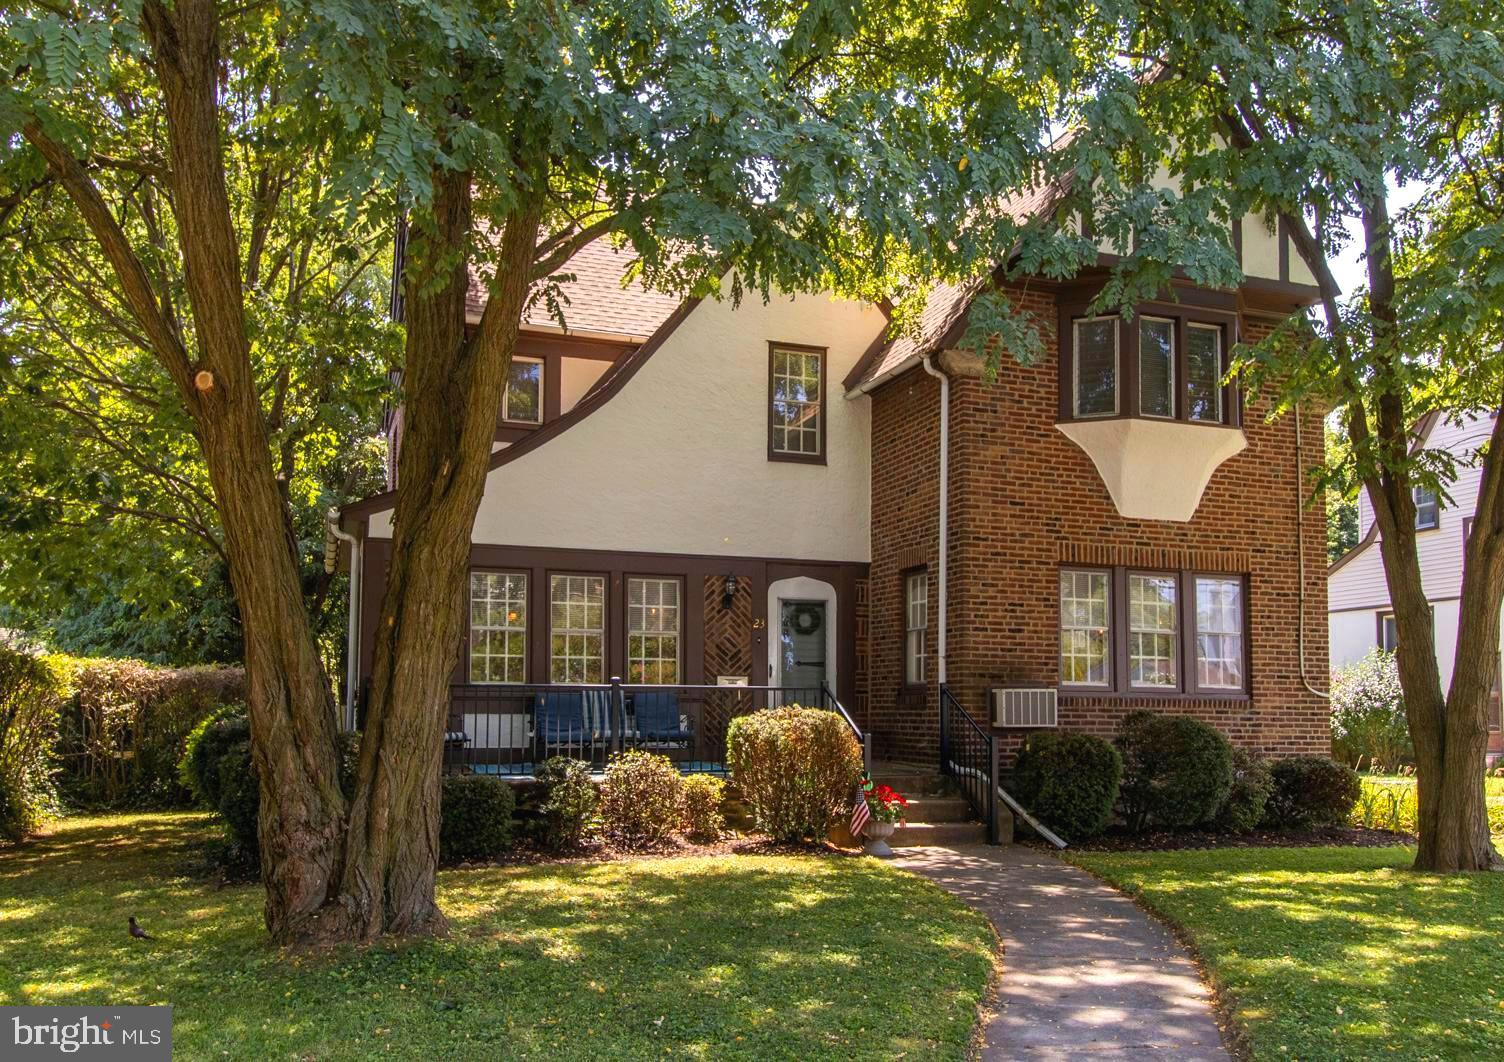 23 E Mercer Avenue, Havertown, PA 19083